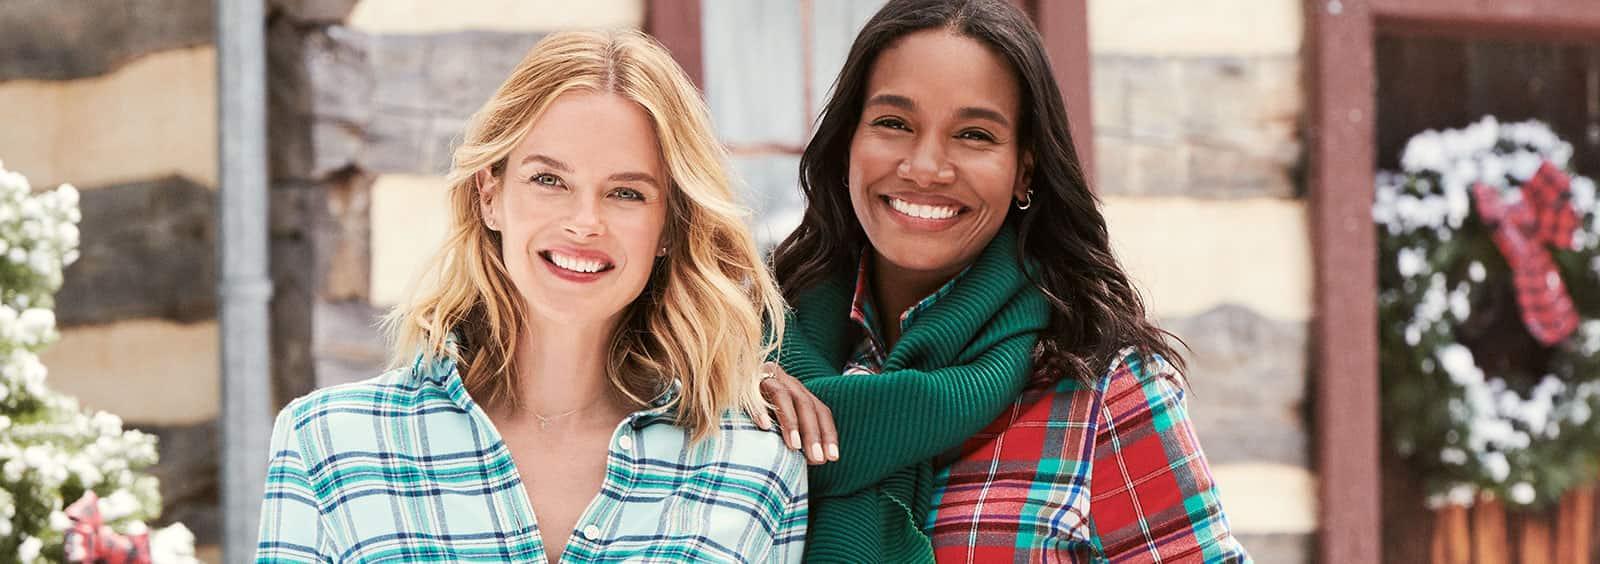 Chic Ways to Wear a Flannel Button-Down